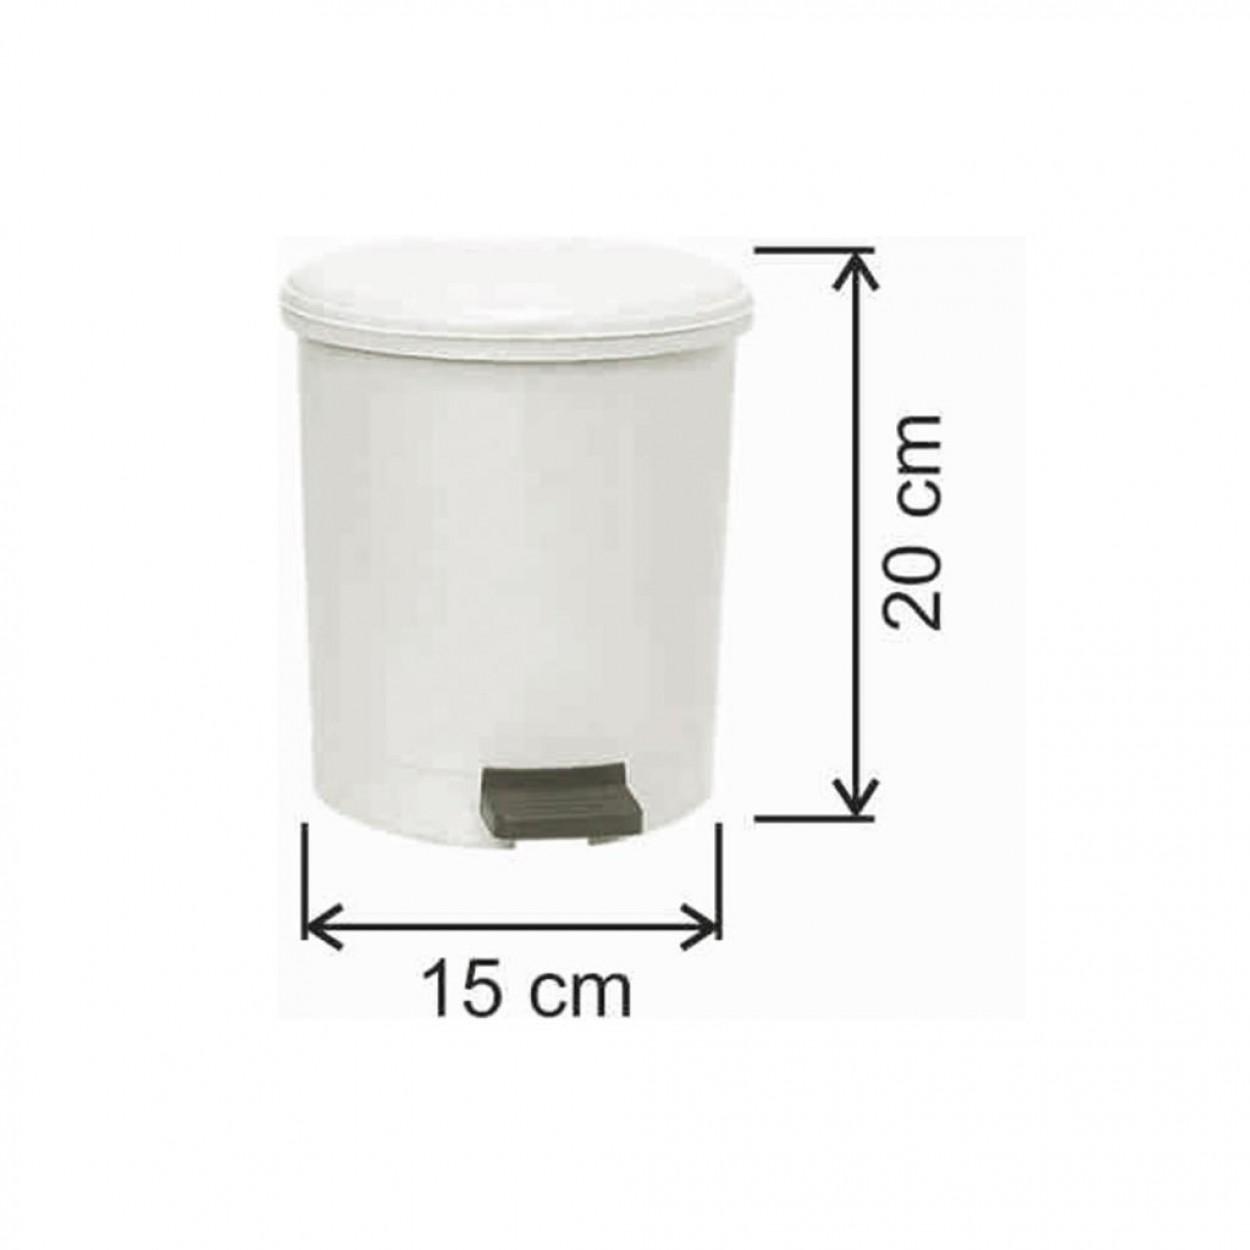 Pedallı Plastik Çöp Kovası Yuvarlak 3.5 Litre